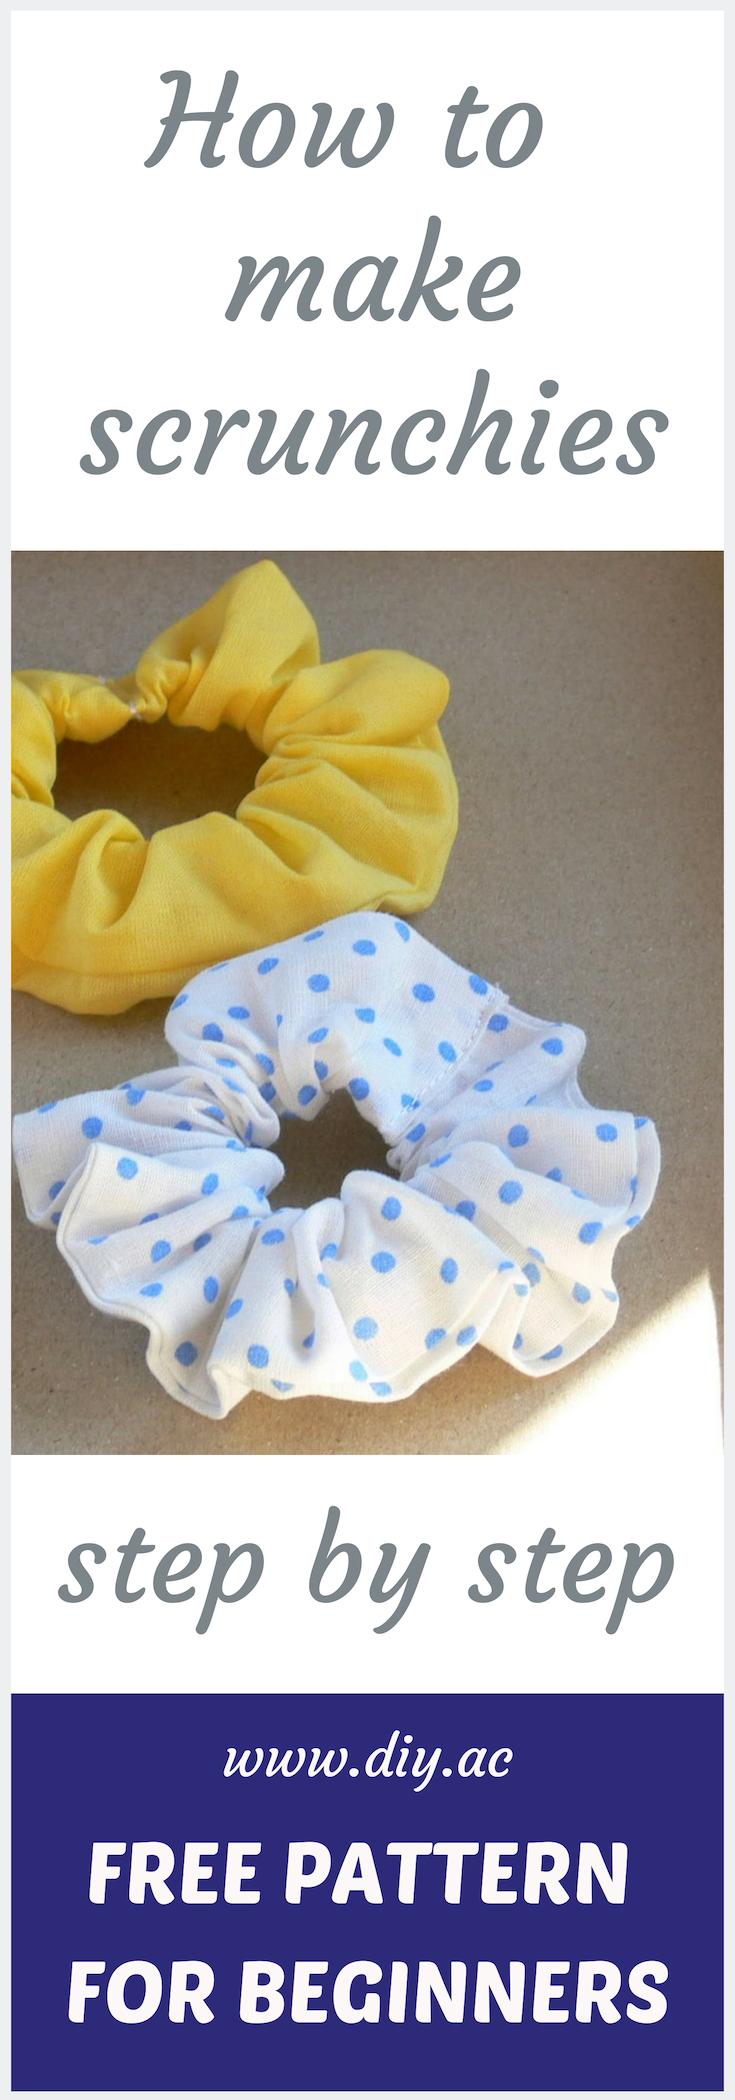 Free sewing pattern for beginners - SCRUNCHIES DIY #scrunchiesdiy